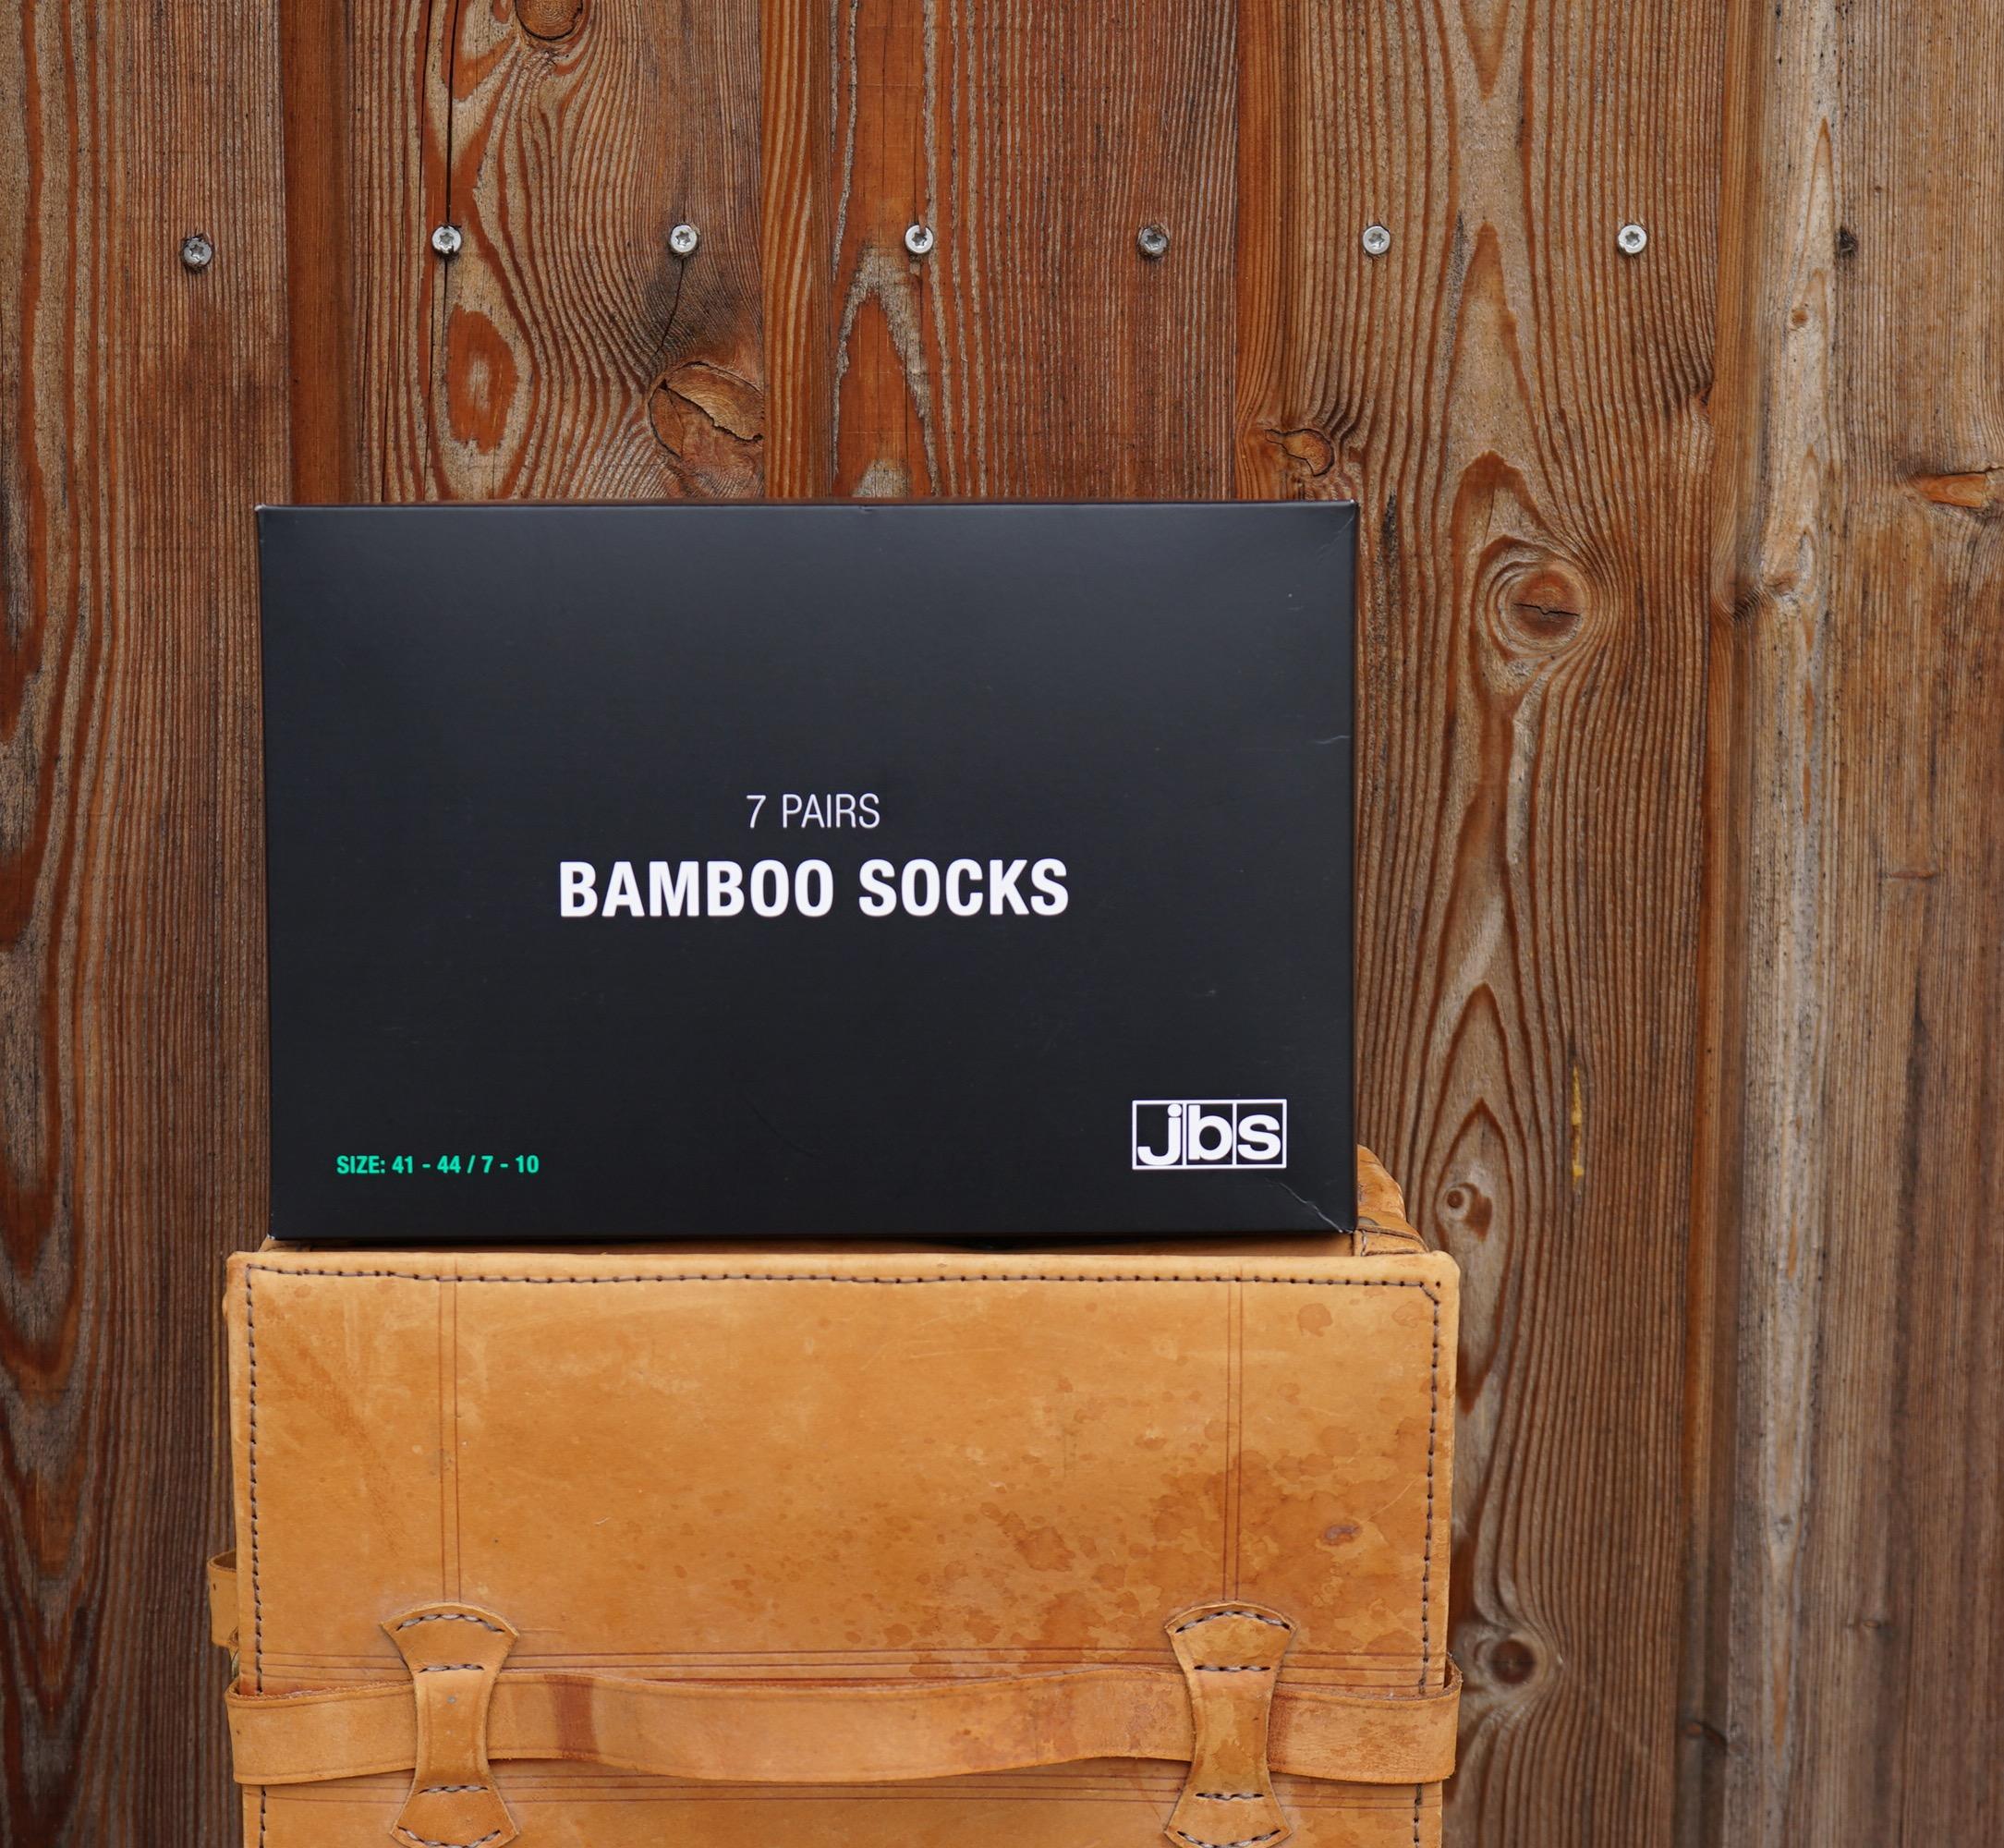 JBS Bamboo strømper 2000 99